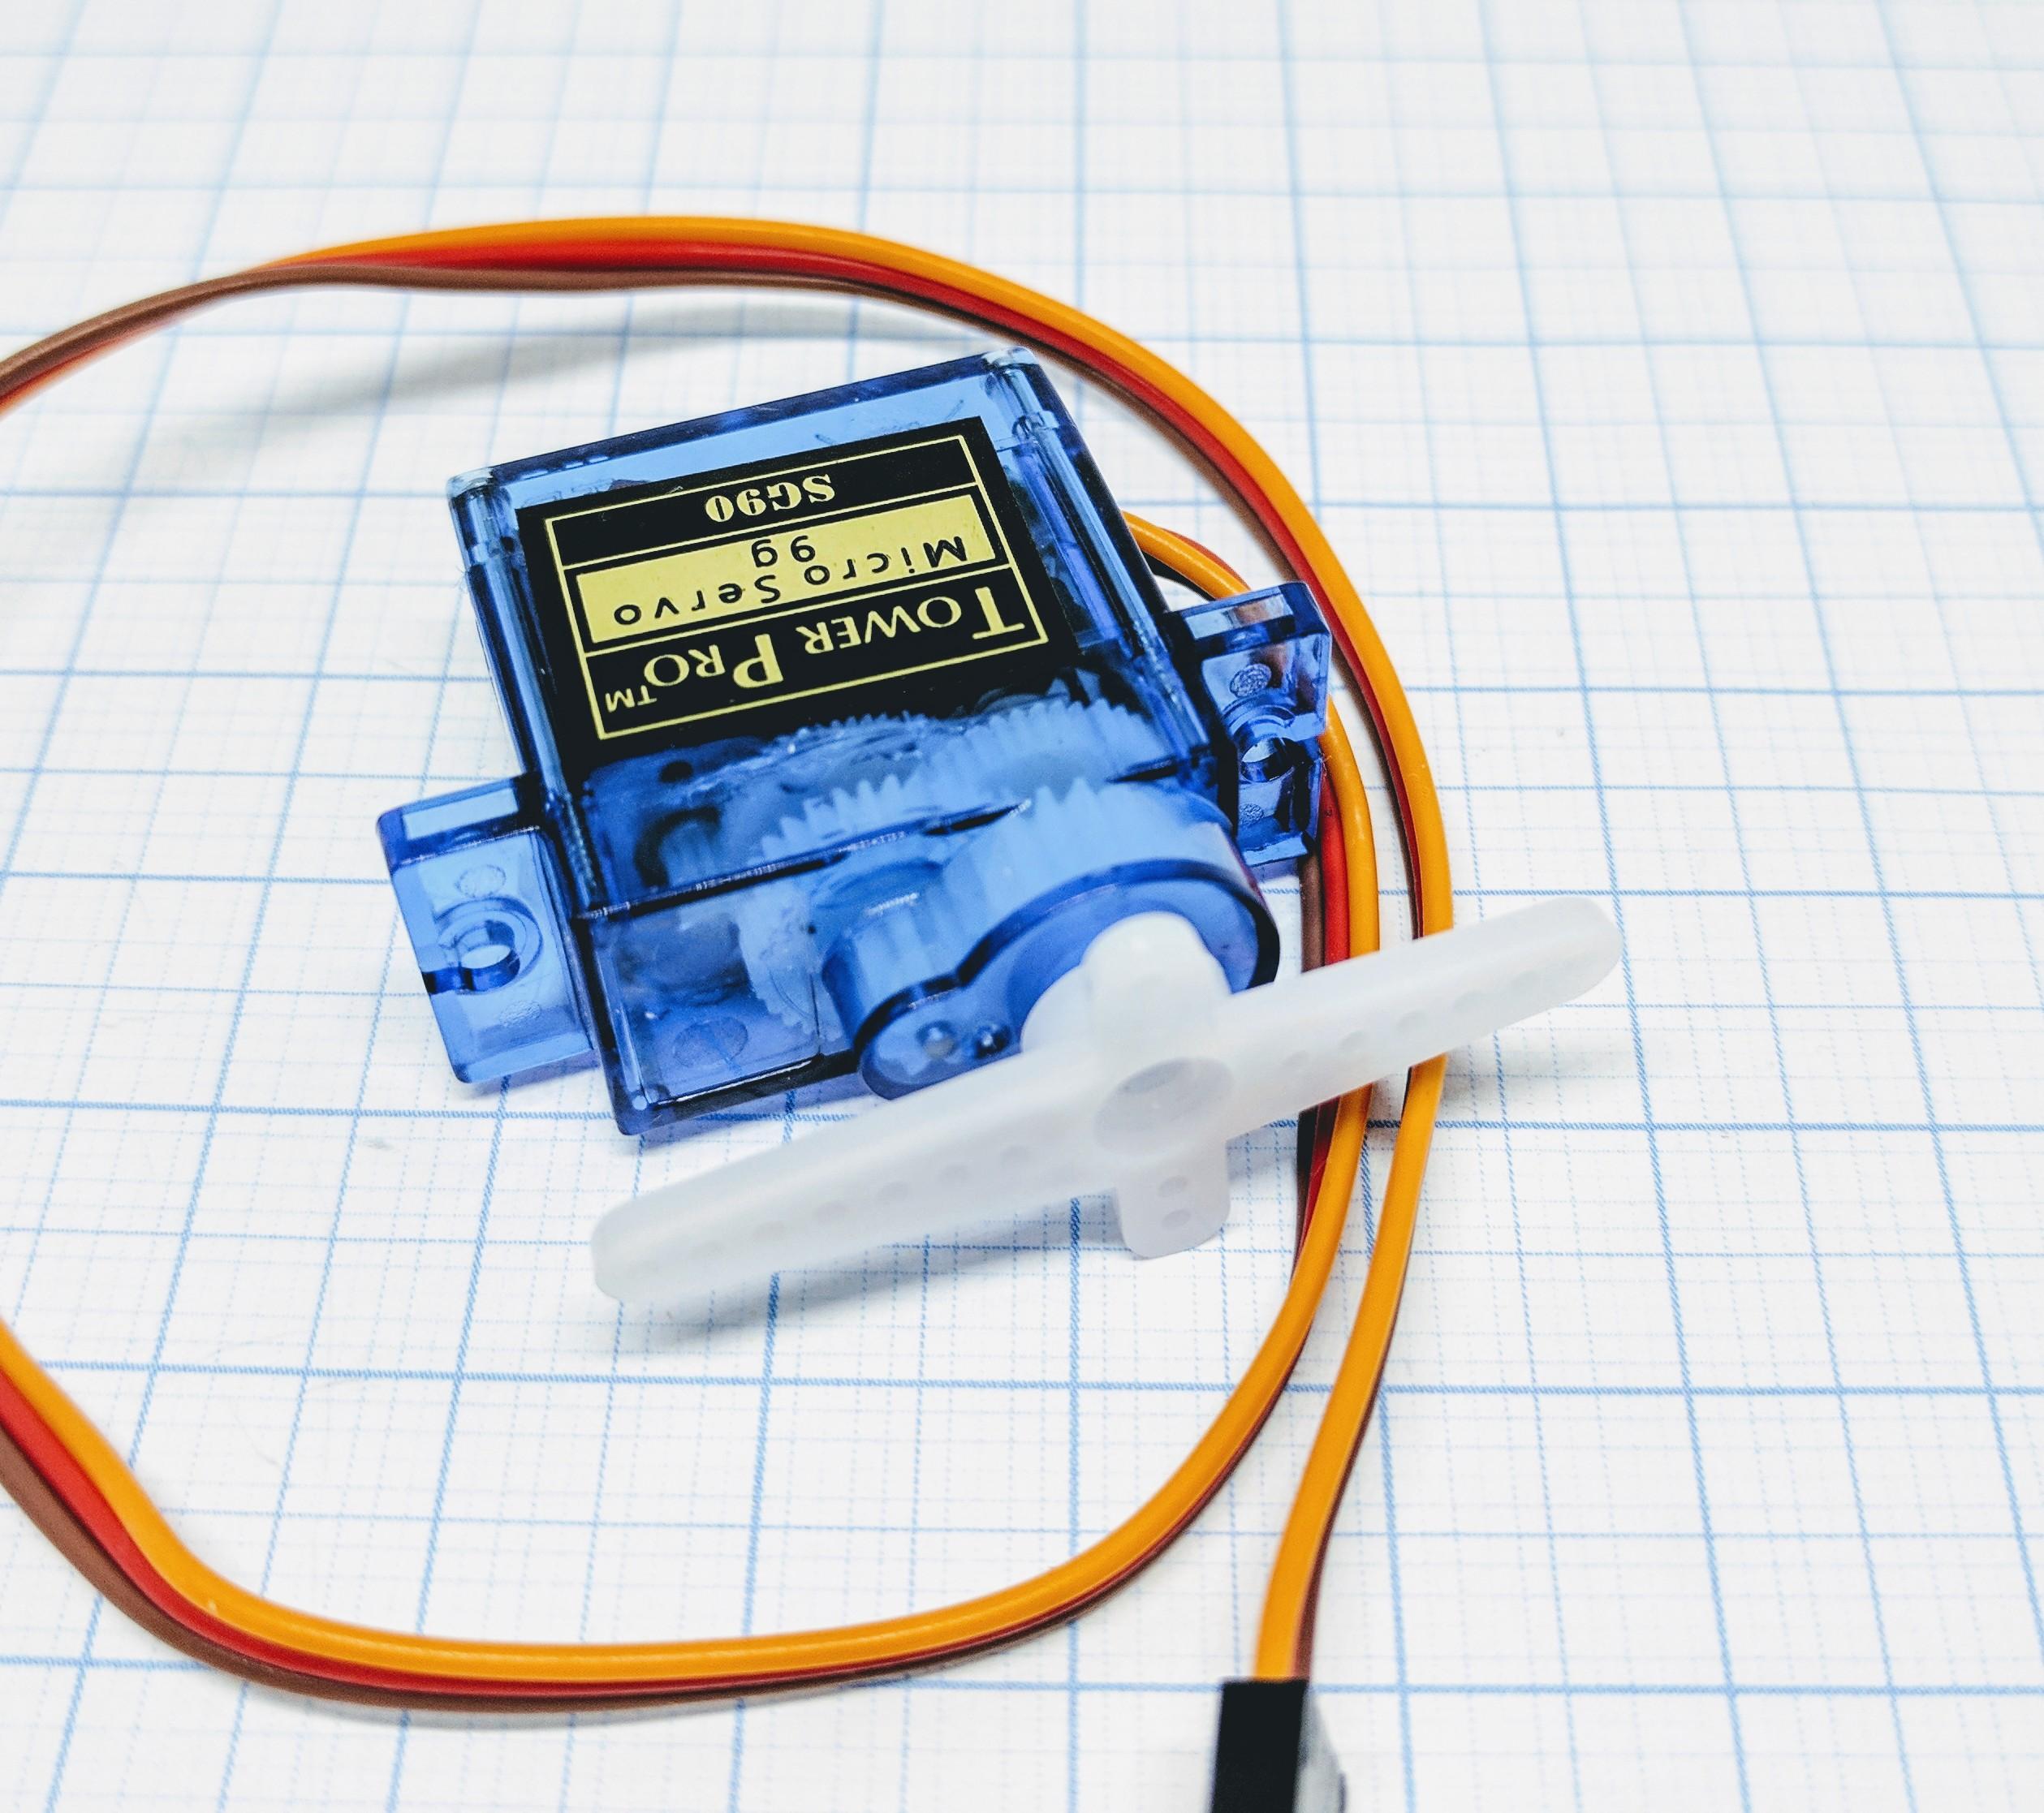 Wondrous Servo Motor Esp Easy 2 1 Beta1 Documentation Wiring 101 Xrenketaxxcnl